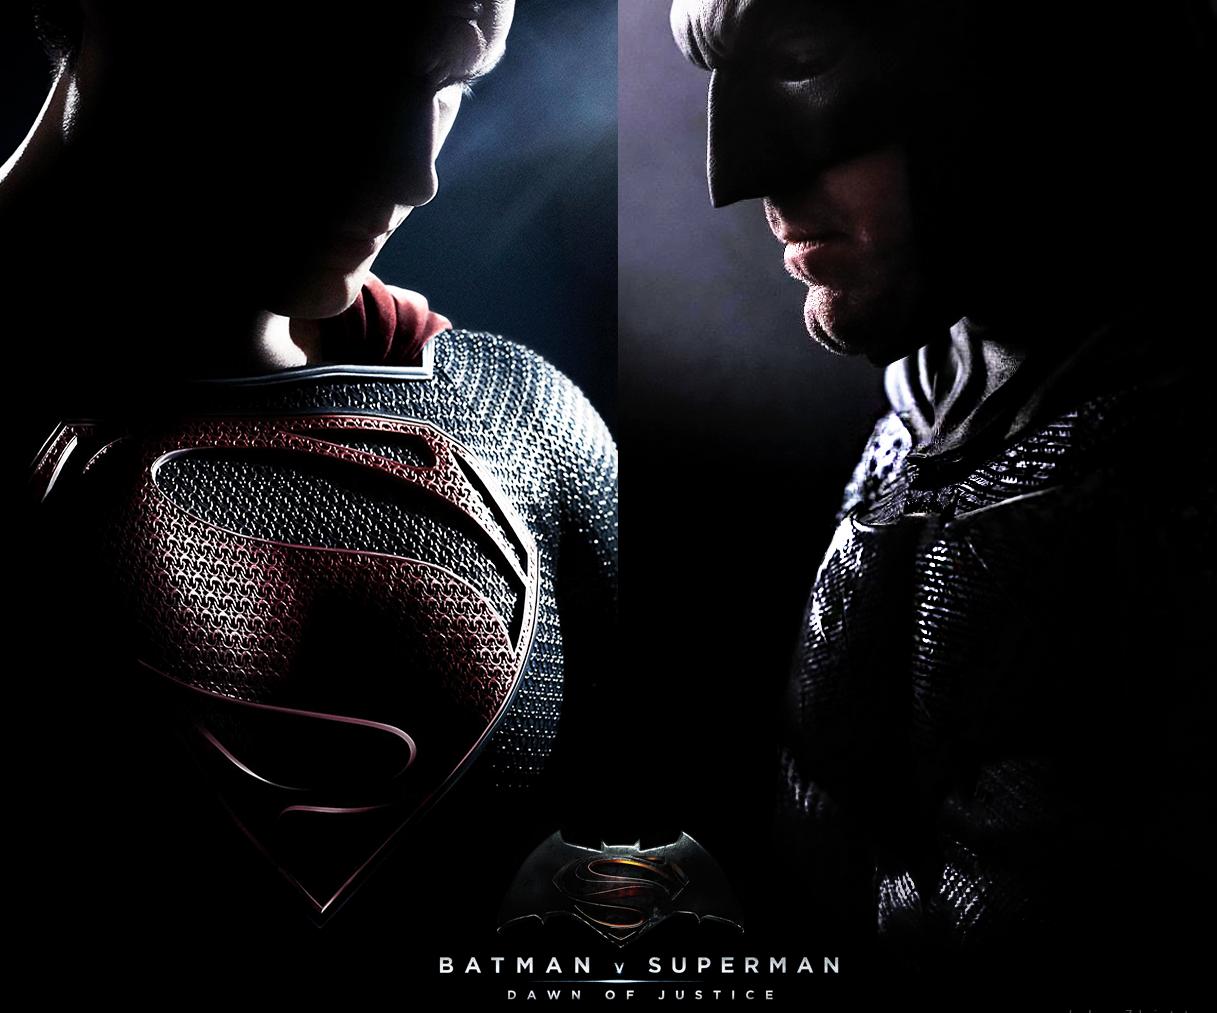 Free Download Batman Vs Superman Dawn Of Justice Hd Wallpaper